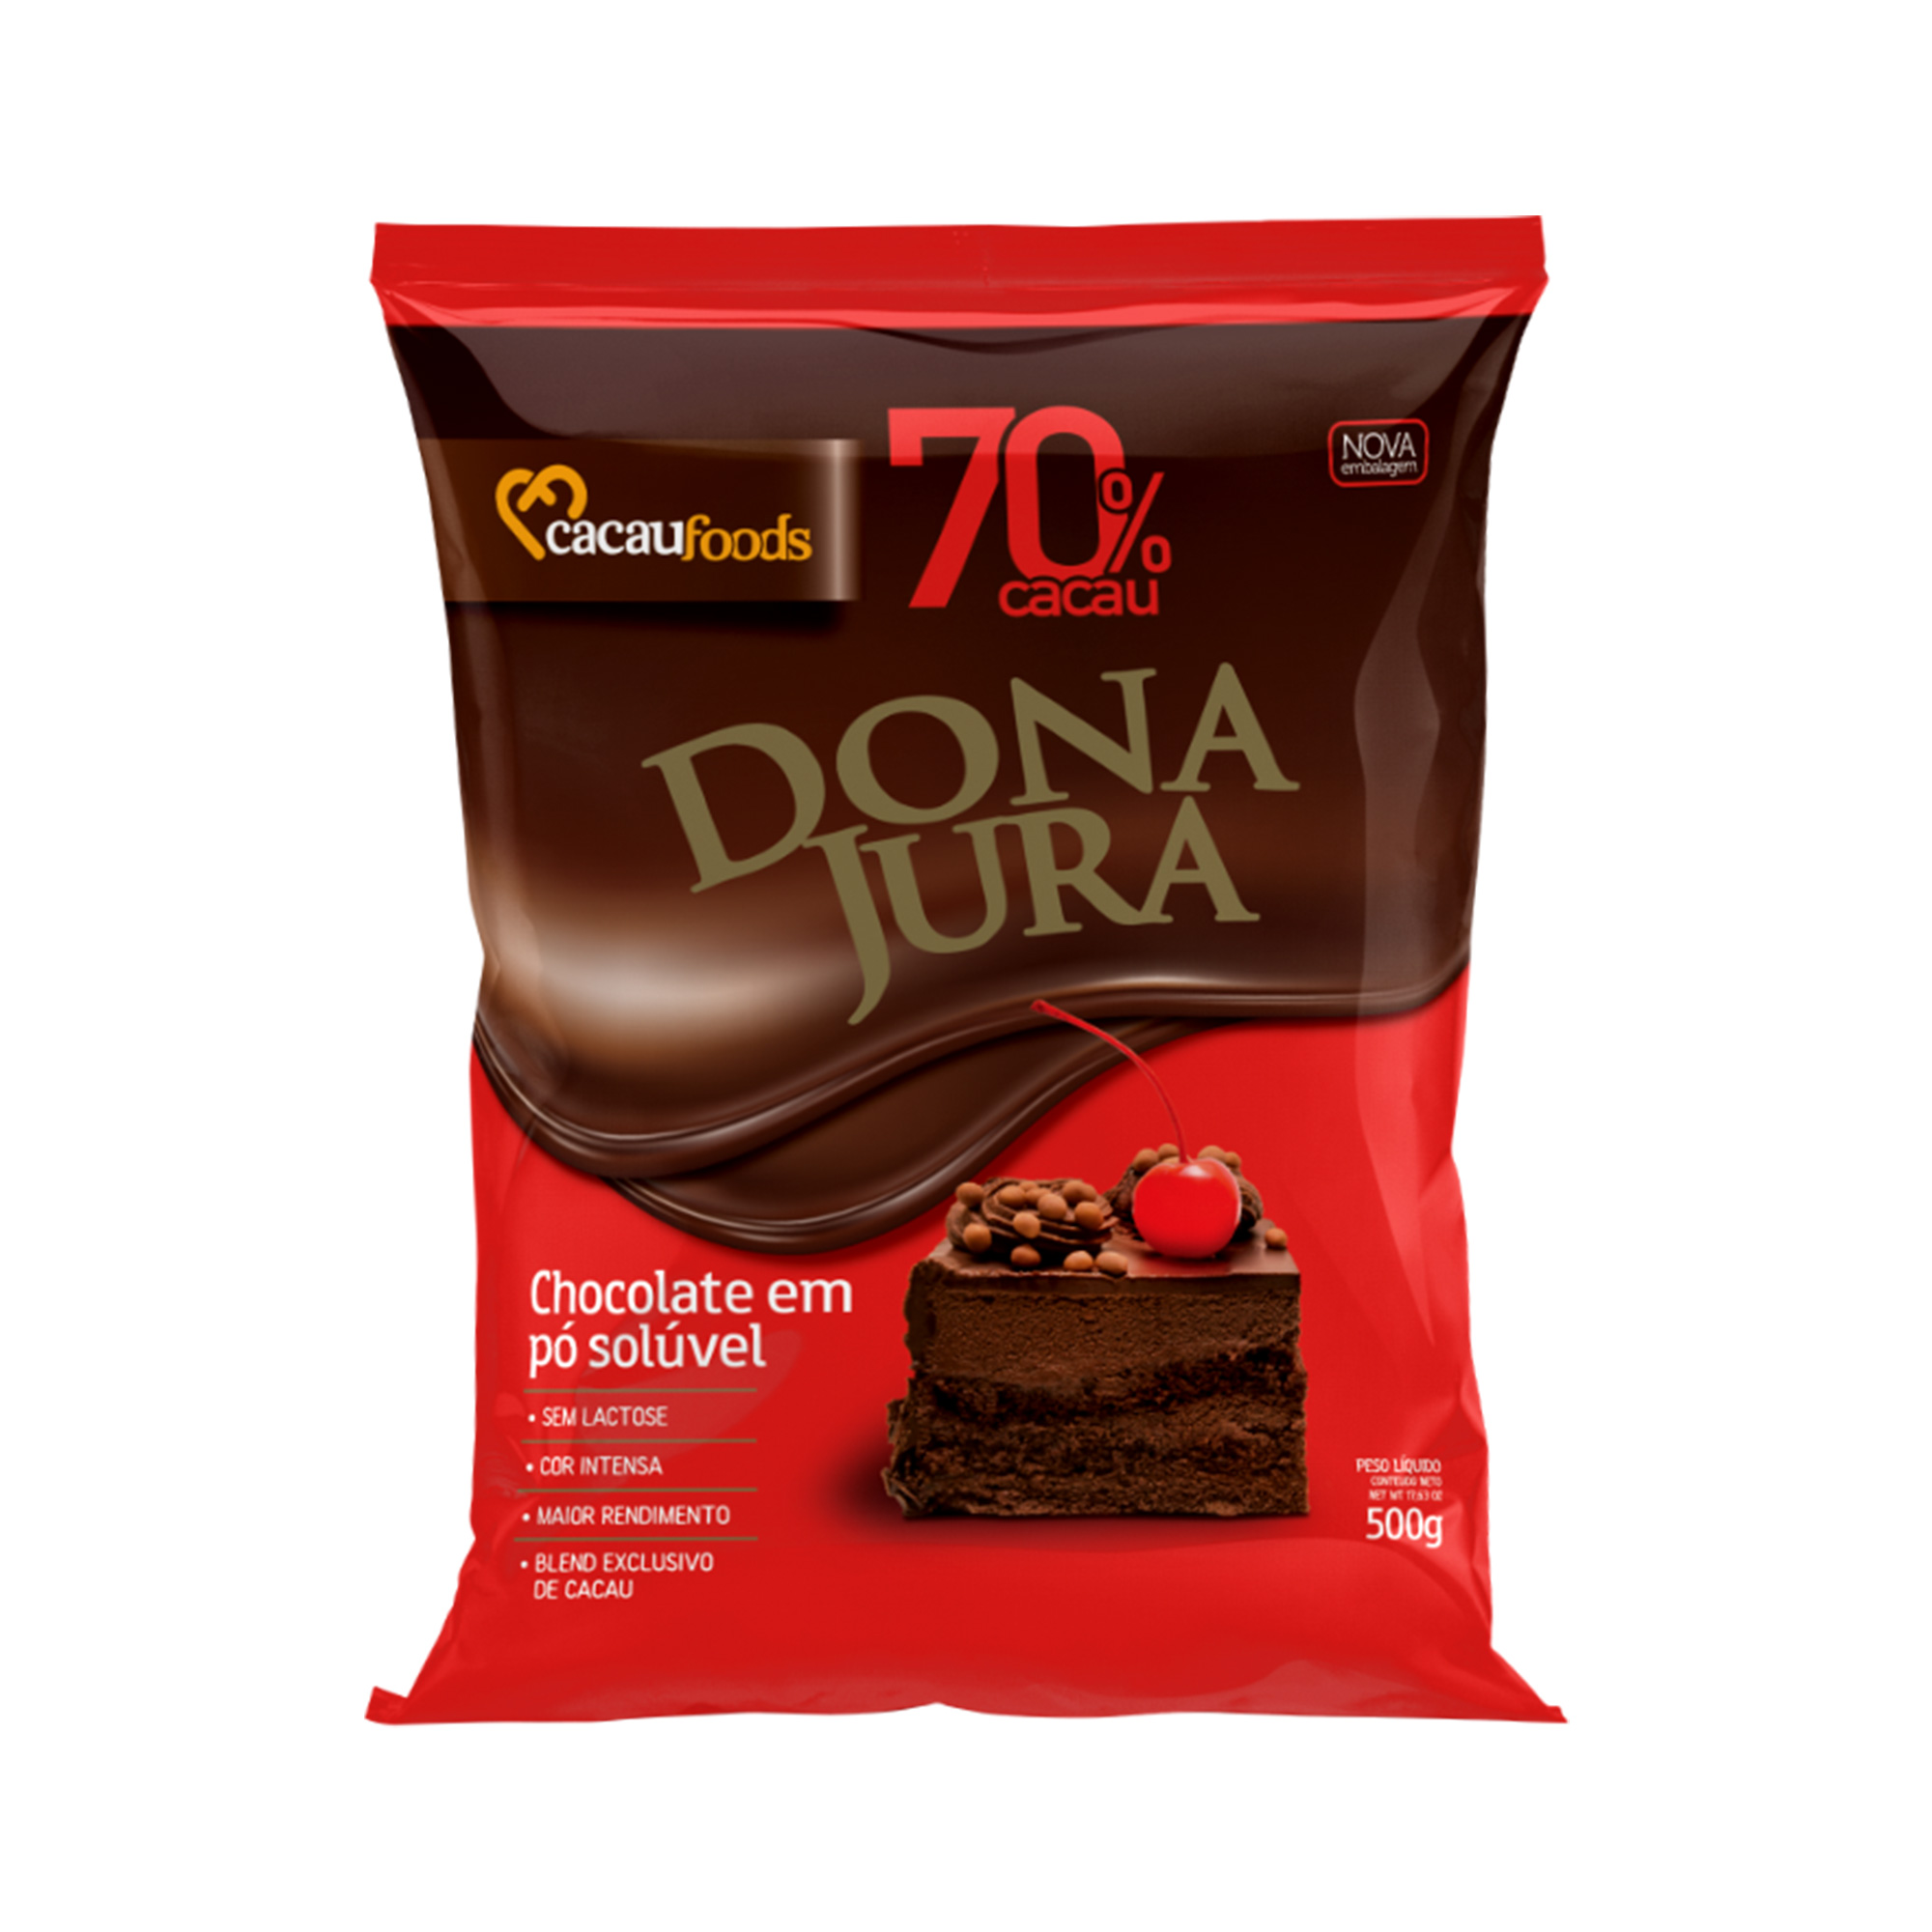 CHOCOLATE EM PO DONA JURA 70% 500G  - Santa Bella